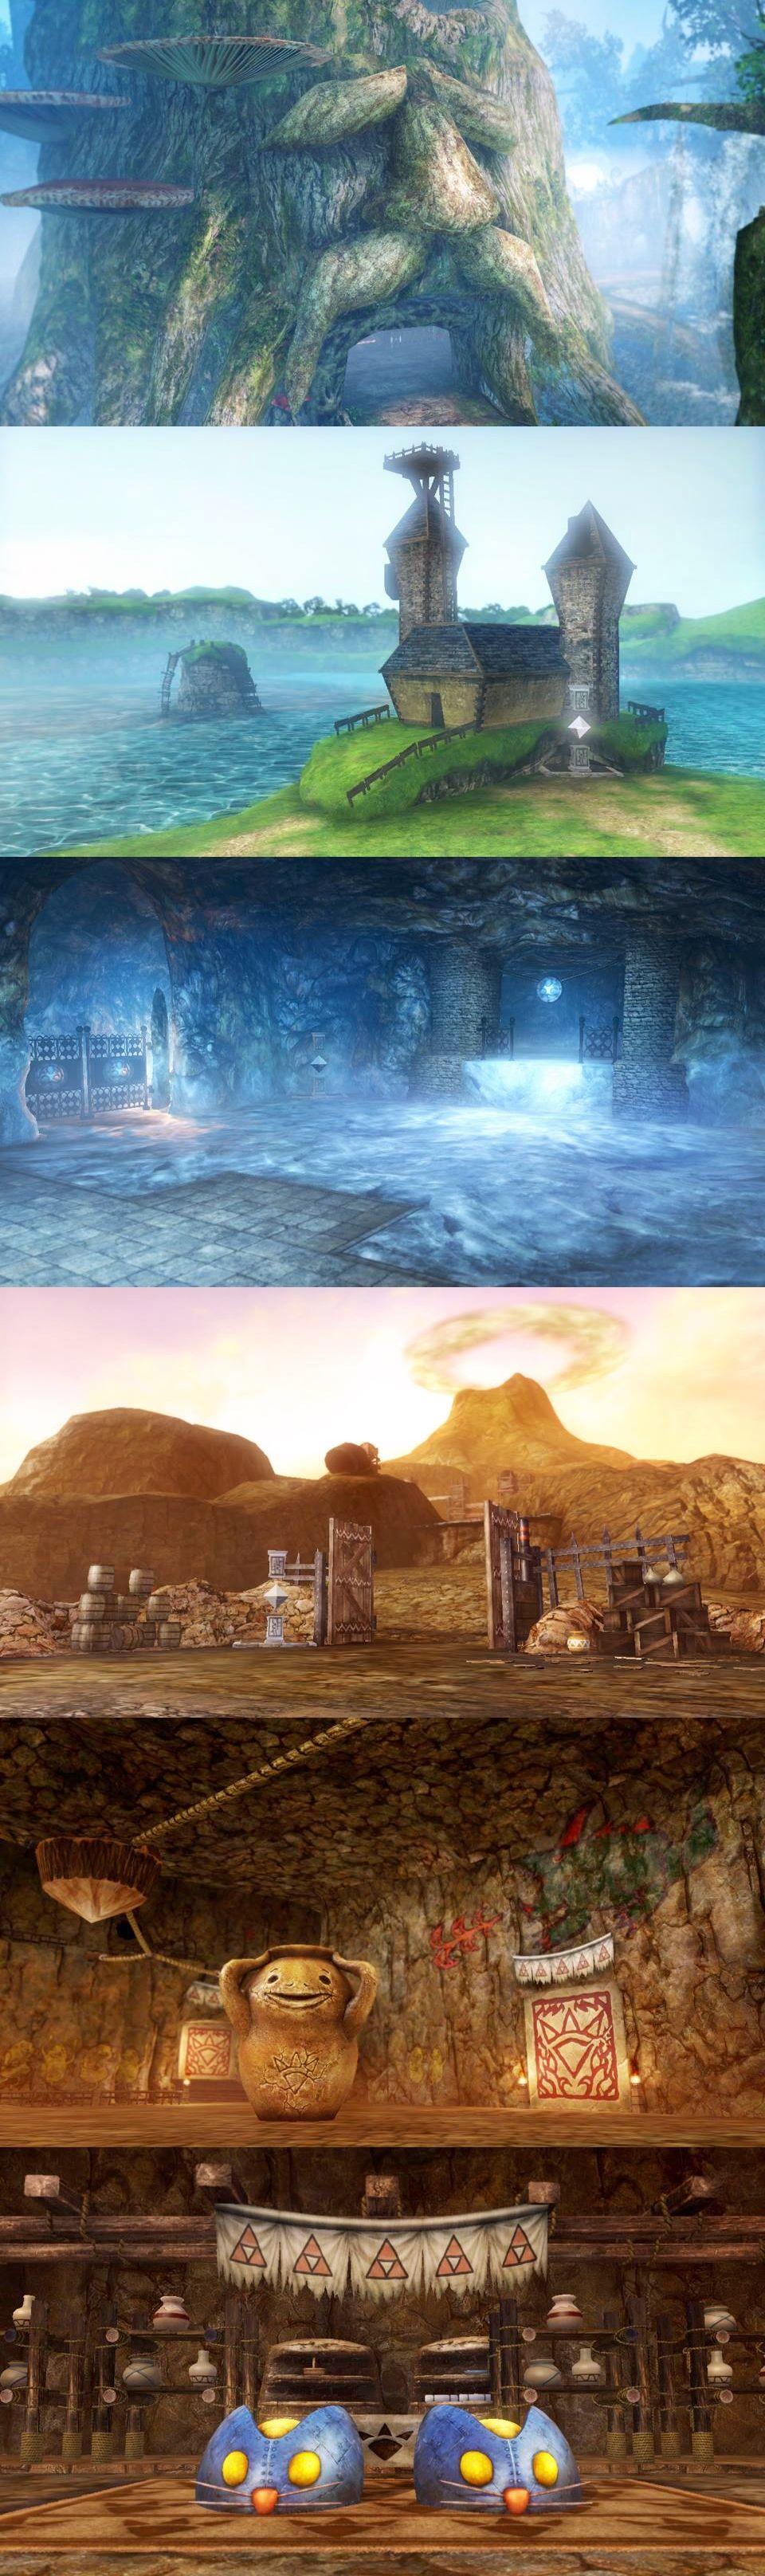 Hyrule Warriors Ocarina Of Time World Levels Zelda Wiiu Legend Of Zelda Hyrule Warriors Pictures